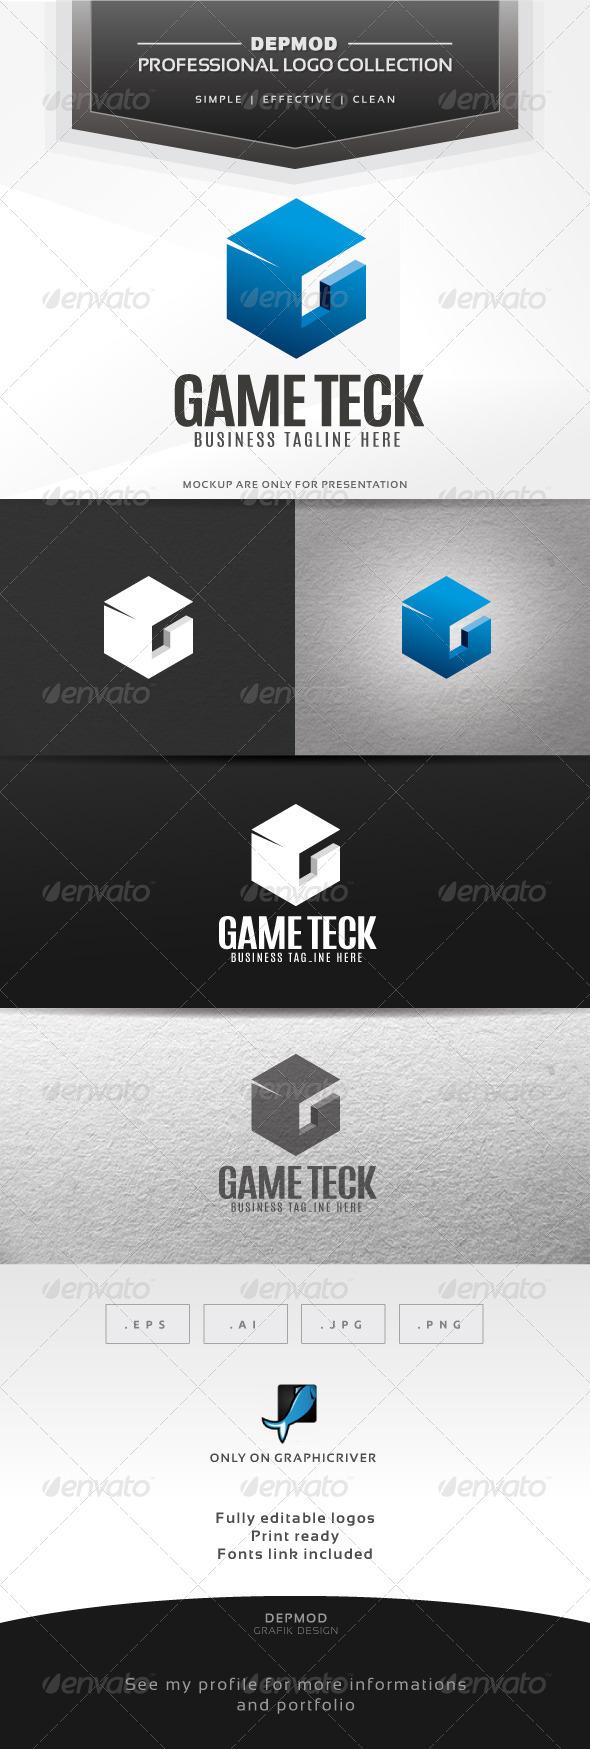 GraphicRiver Game Teck Logo 6360402